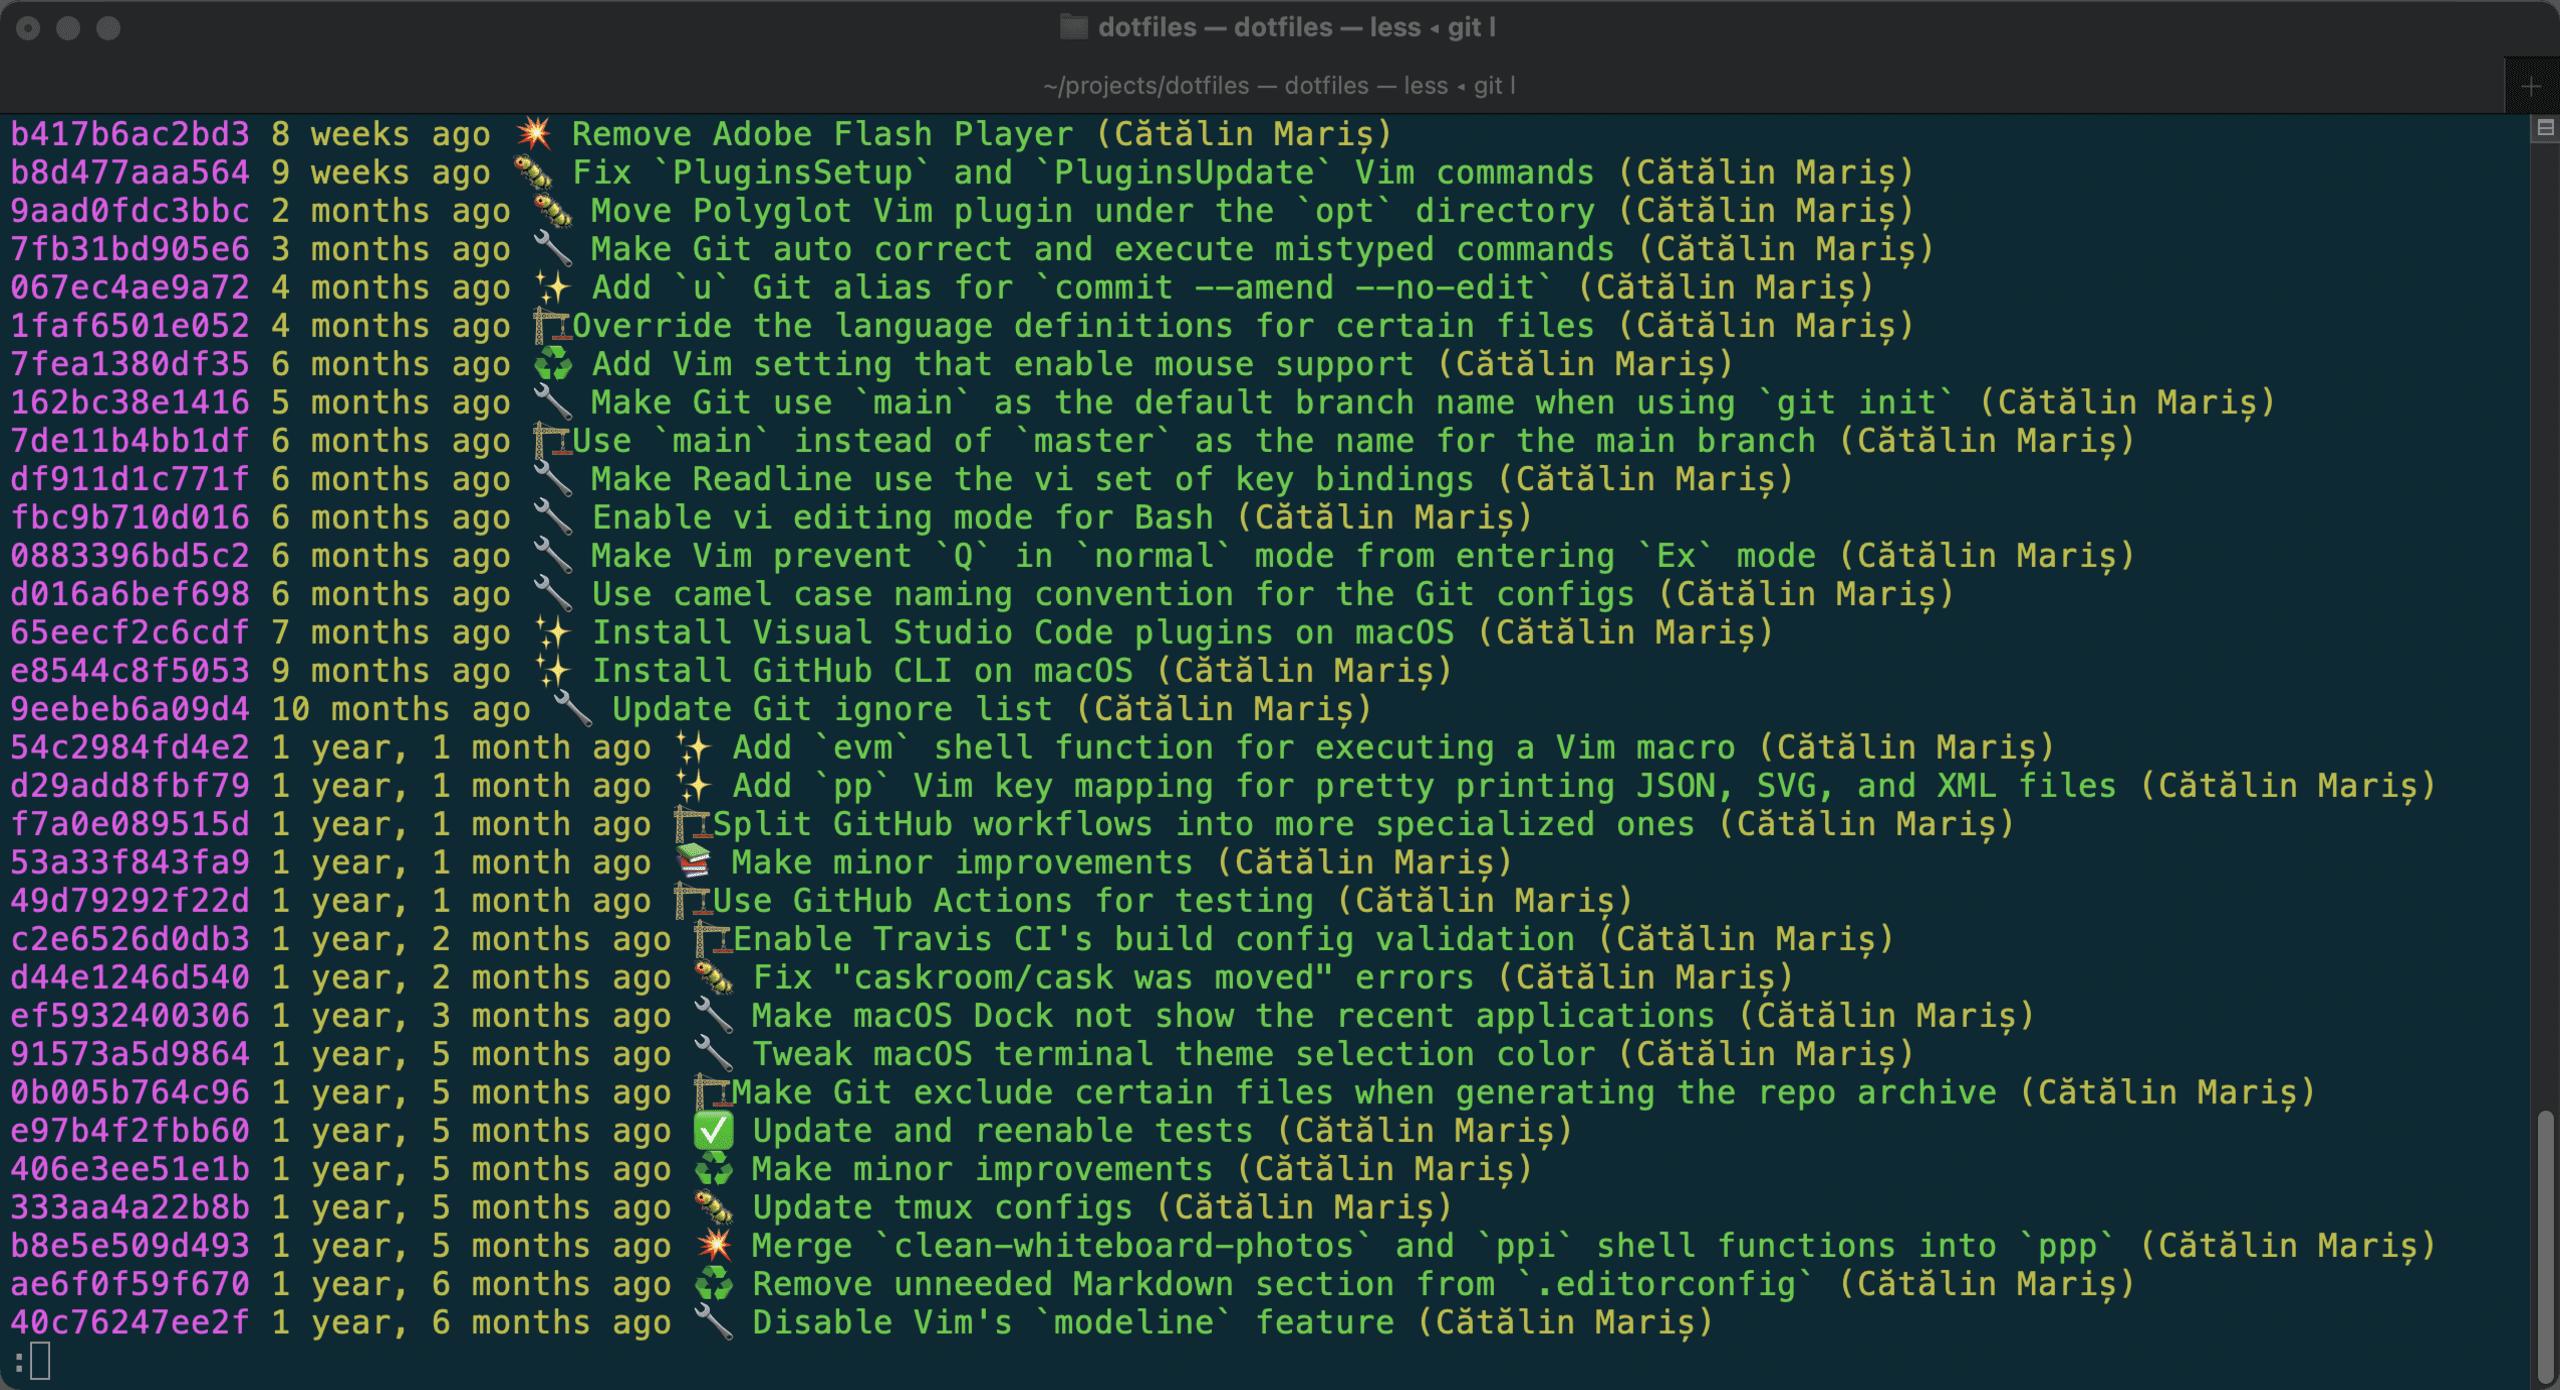 Output for Git log on macOS